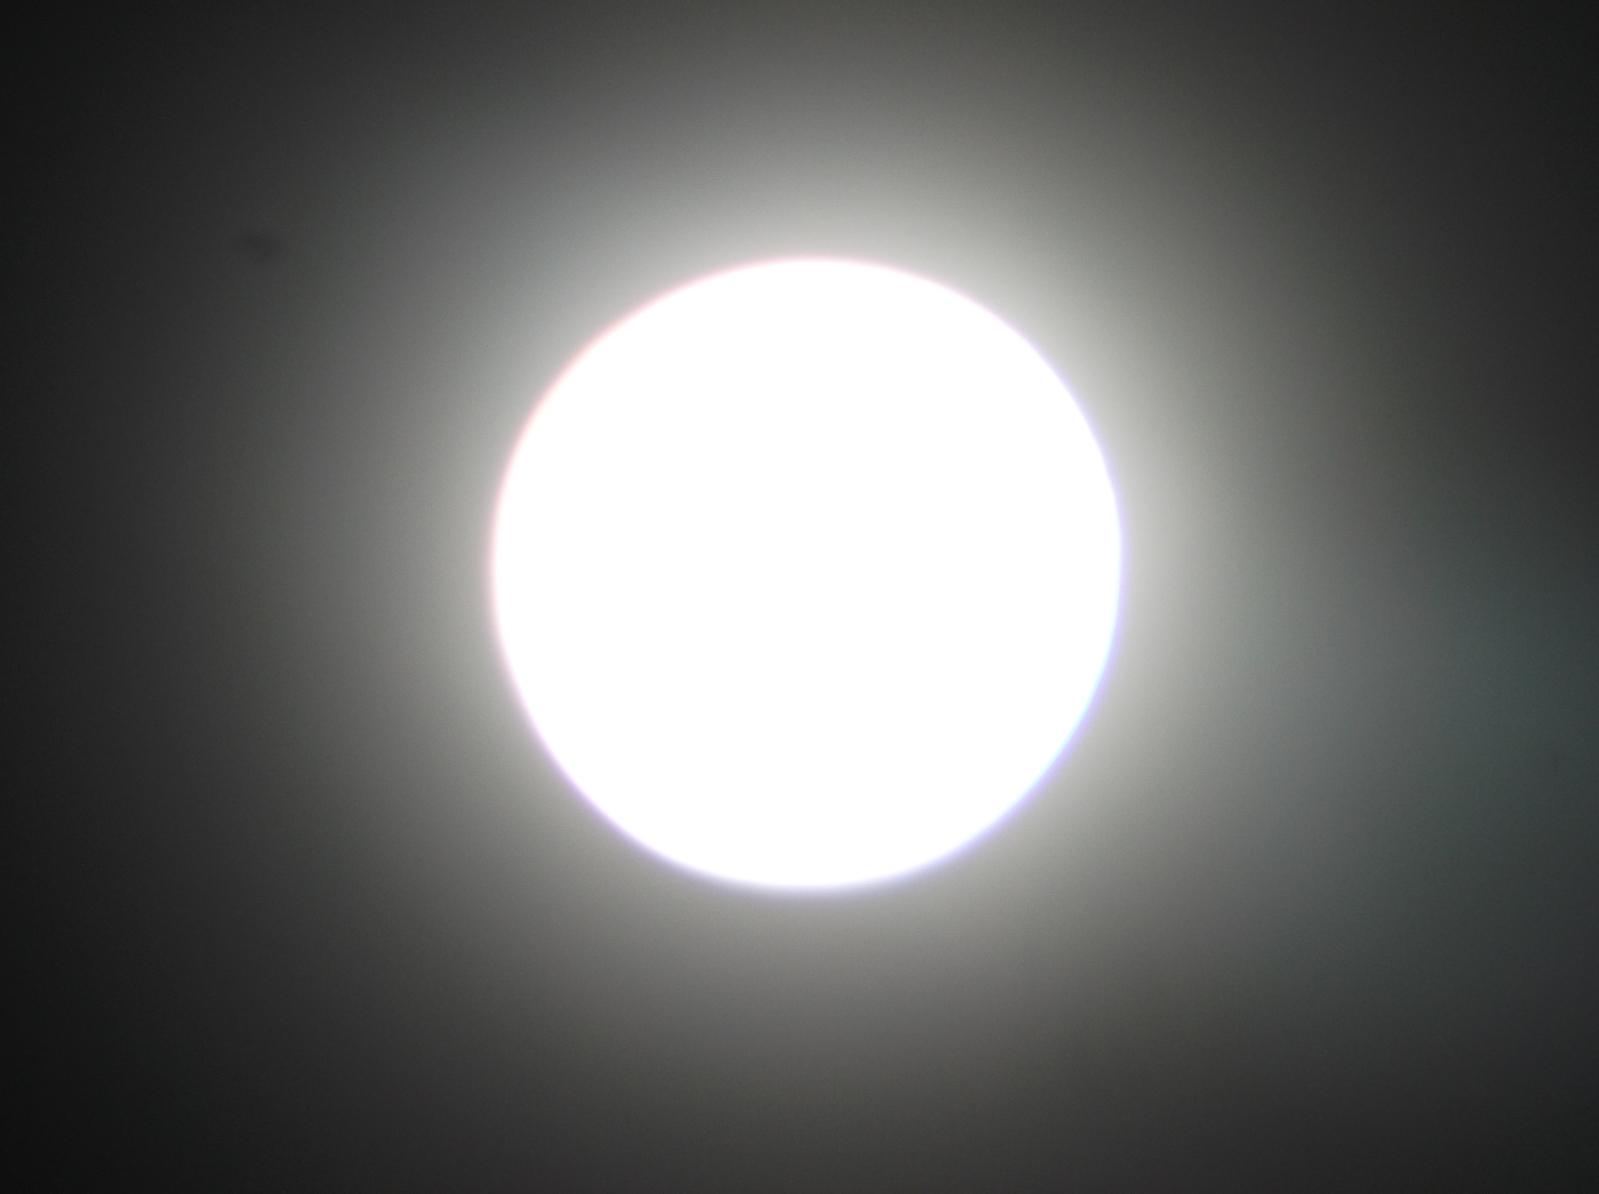 Fotos da Lua - Câmera compacta + Binóculo 10x50 24doq6d